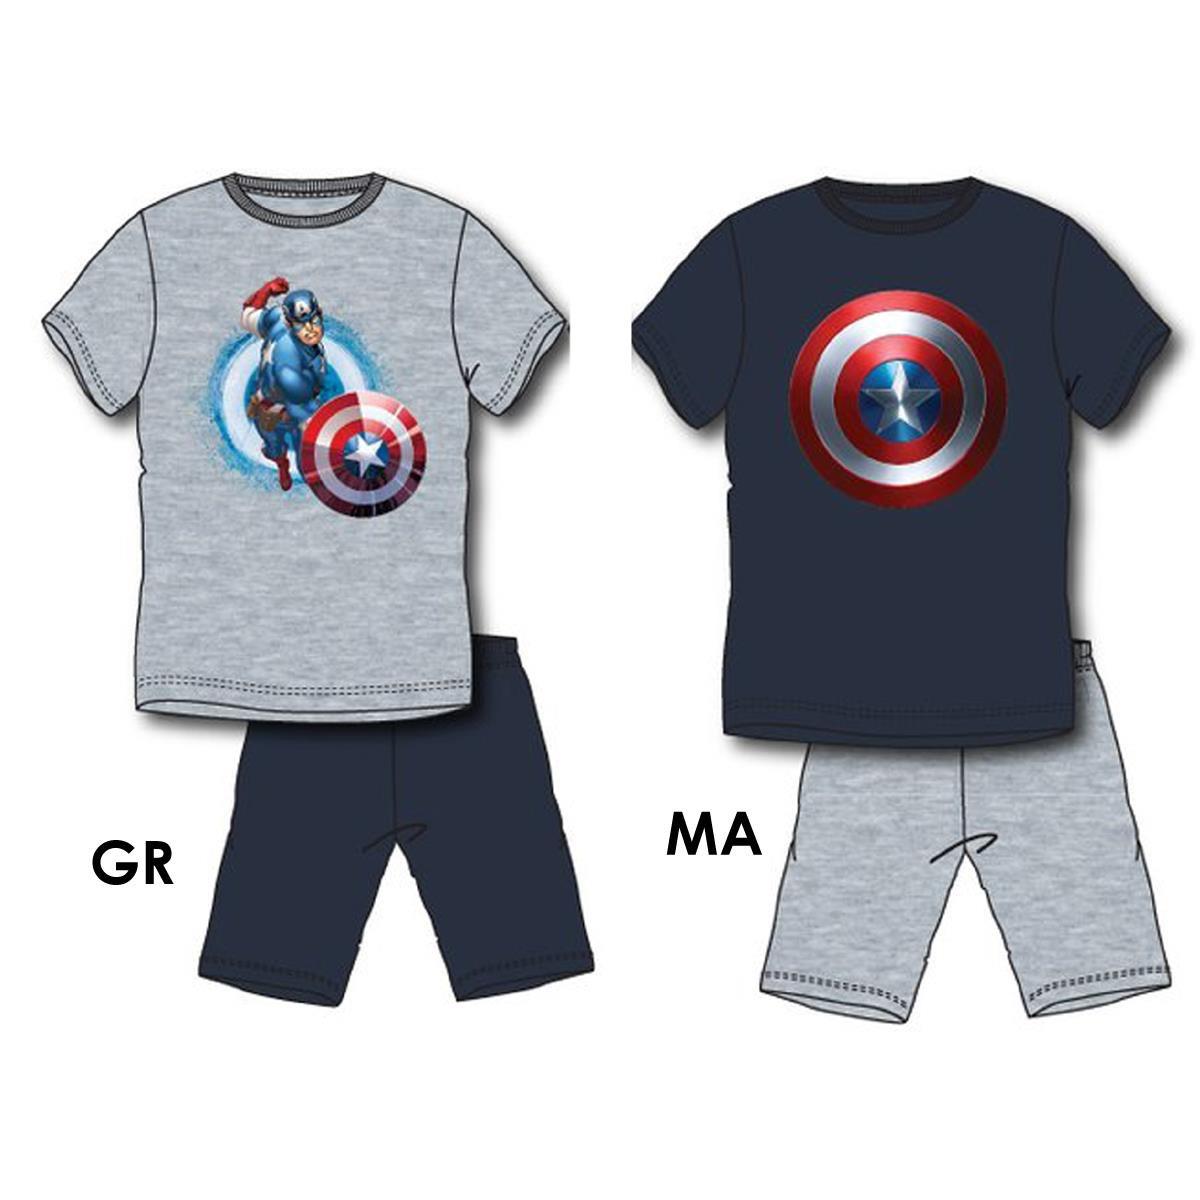 auténtico auténtico auténtico auténtico Descubrir Pijama hombre avengers (los vengadores) verano